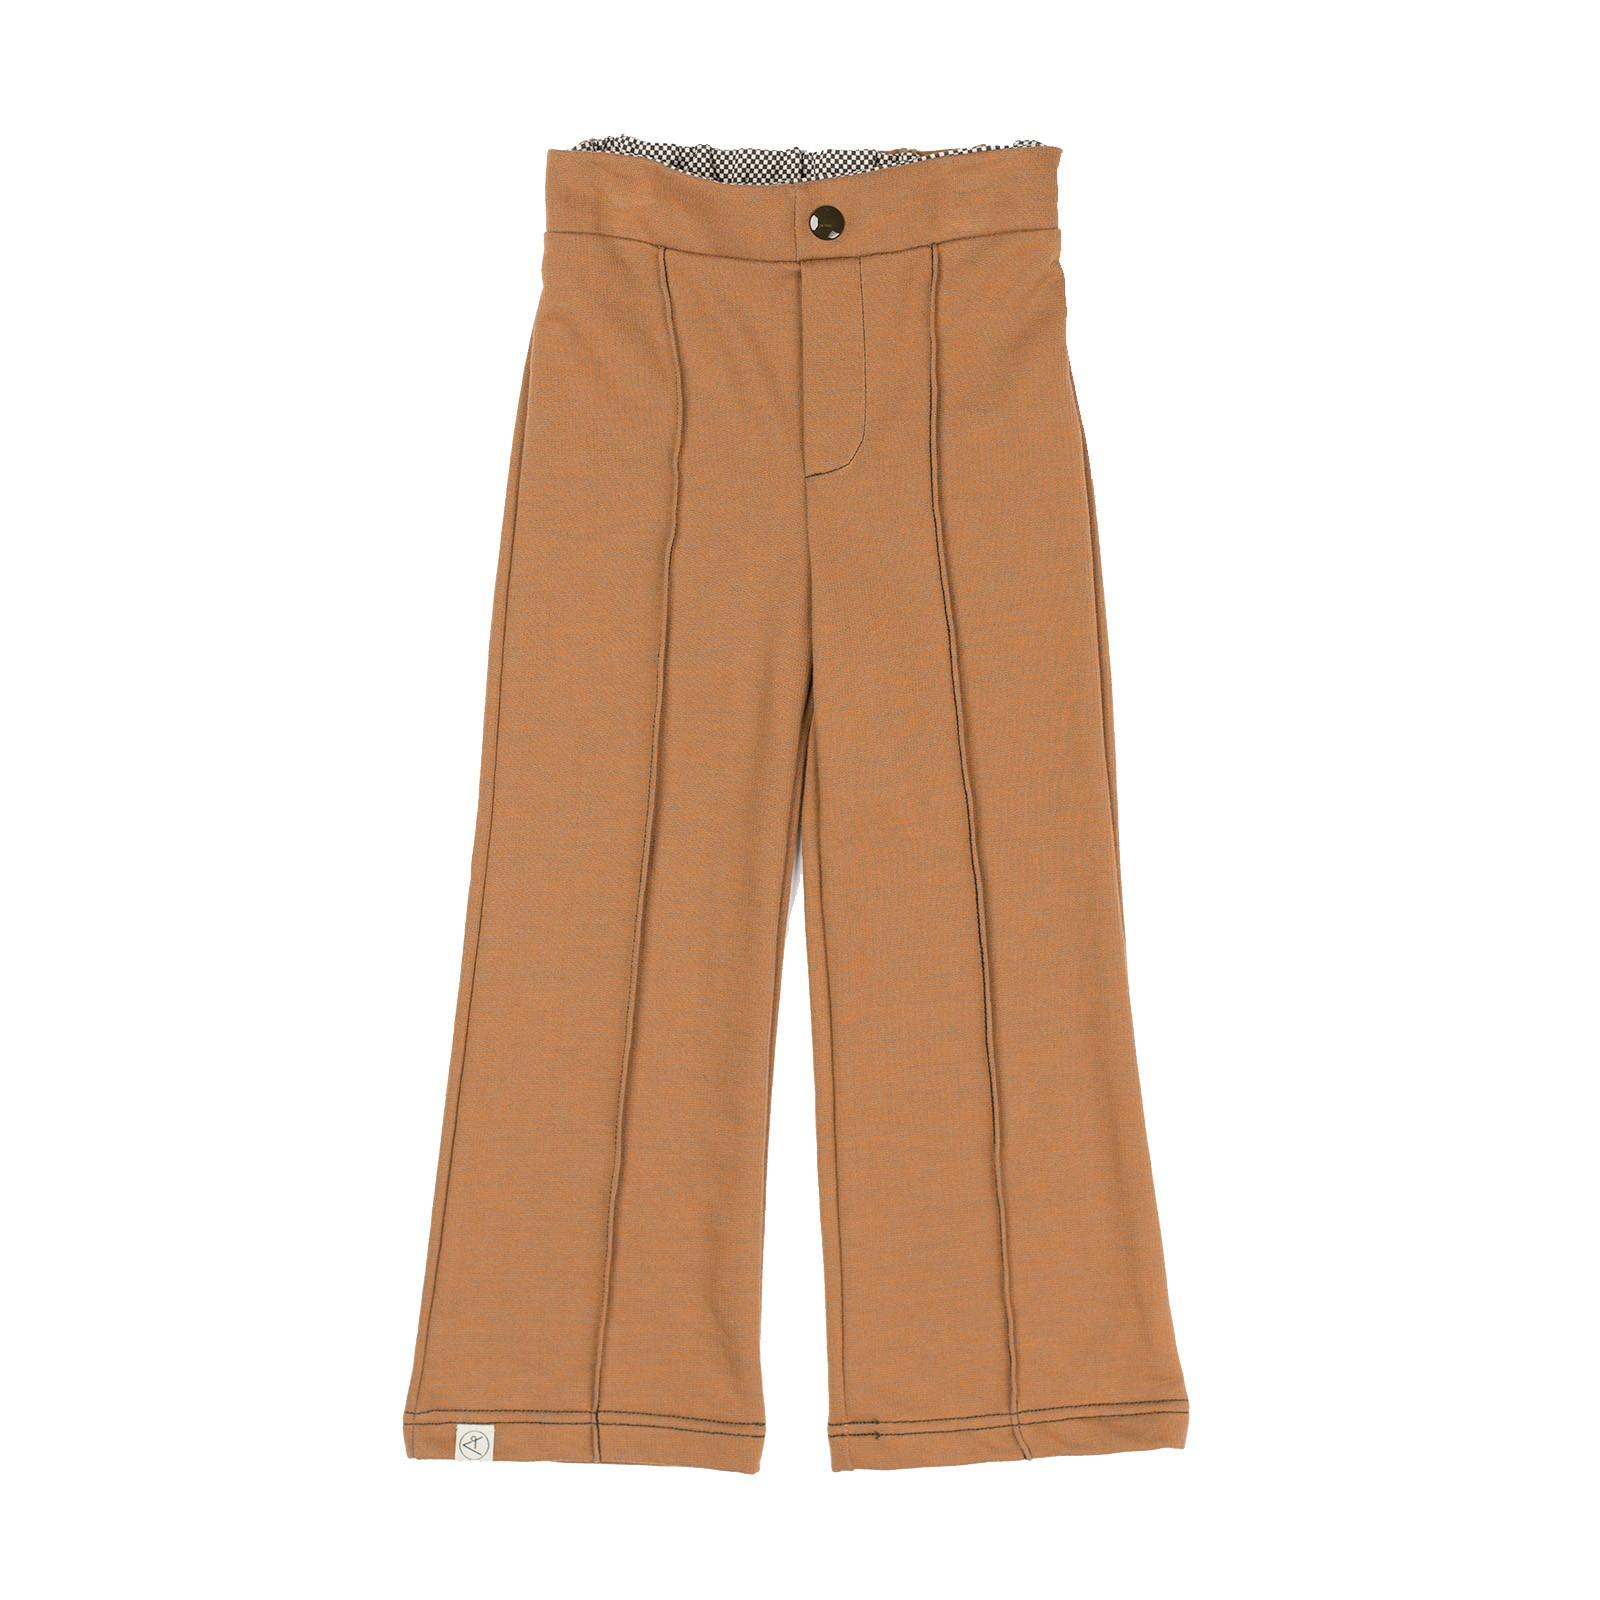 Hecco pants Marmelade